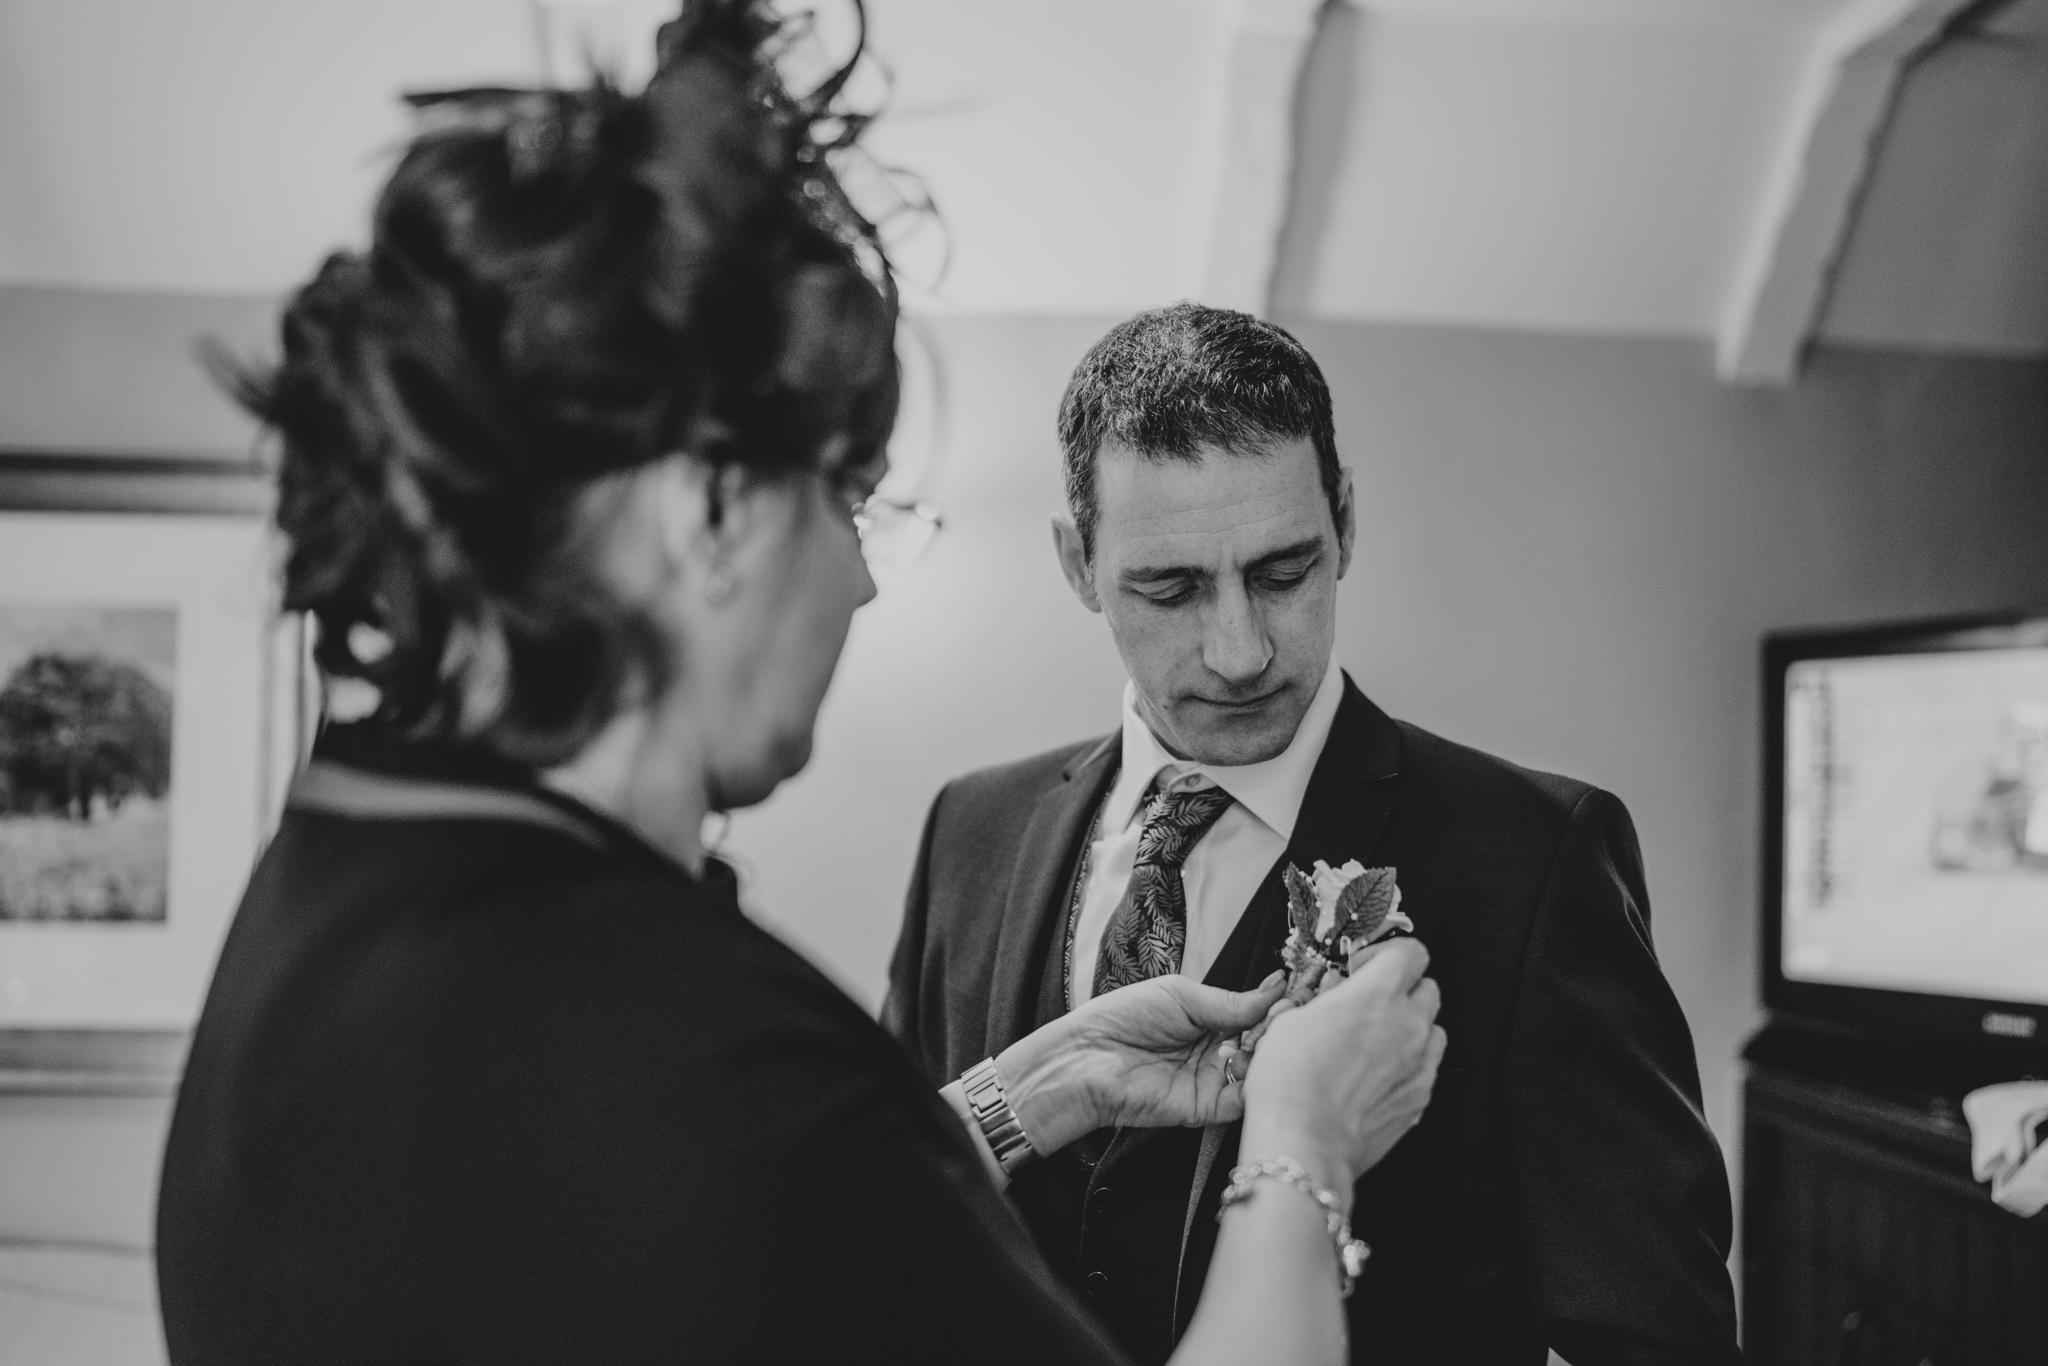 grace-sam-old-barn-clovelly-devon-wedding-photographer-grace-elizabeth-essex-suffolk-norfolk-wedding-photographer (29 of 132).jpg